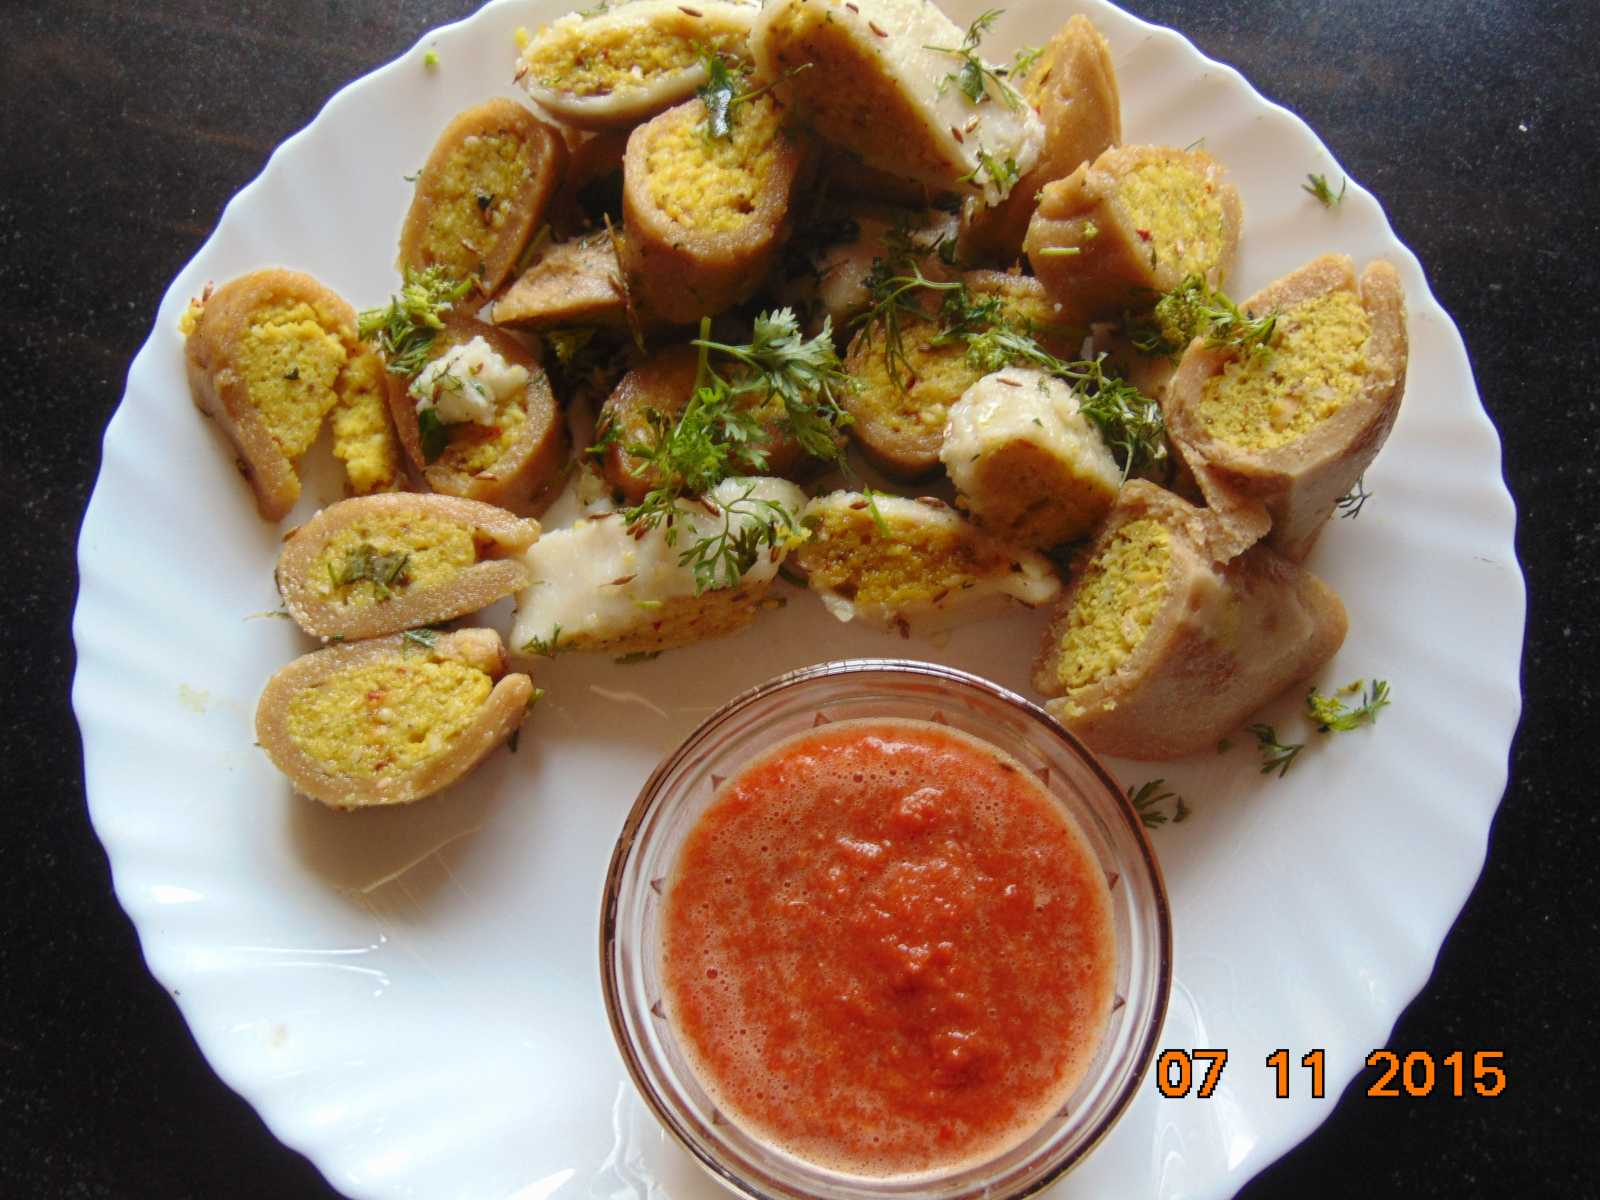 Dal fara recipe indian stuffed lentil dumplings by archanas kitchen dal fara recipe indian stuffed lentil dumplings forumfinder Images